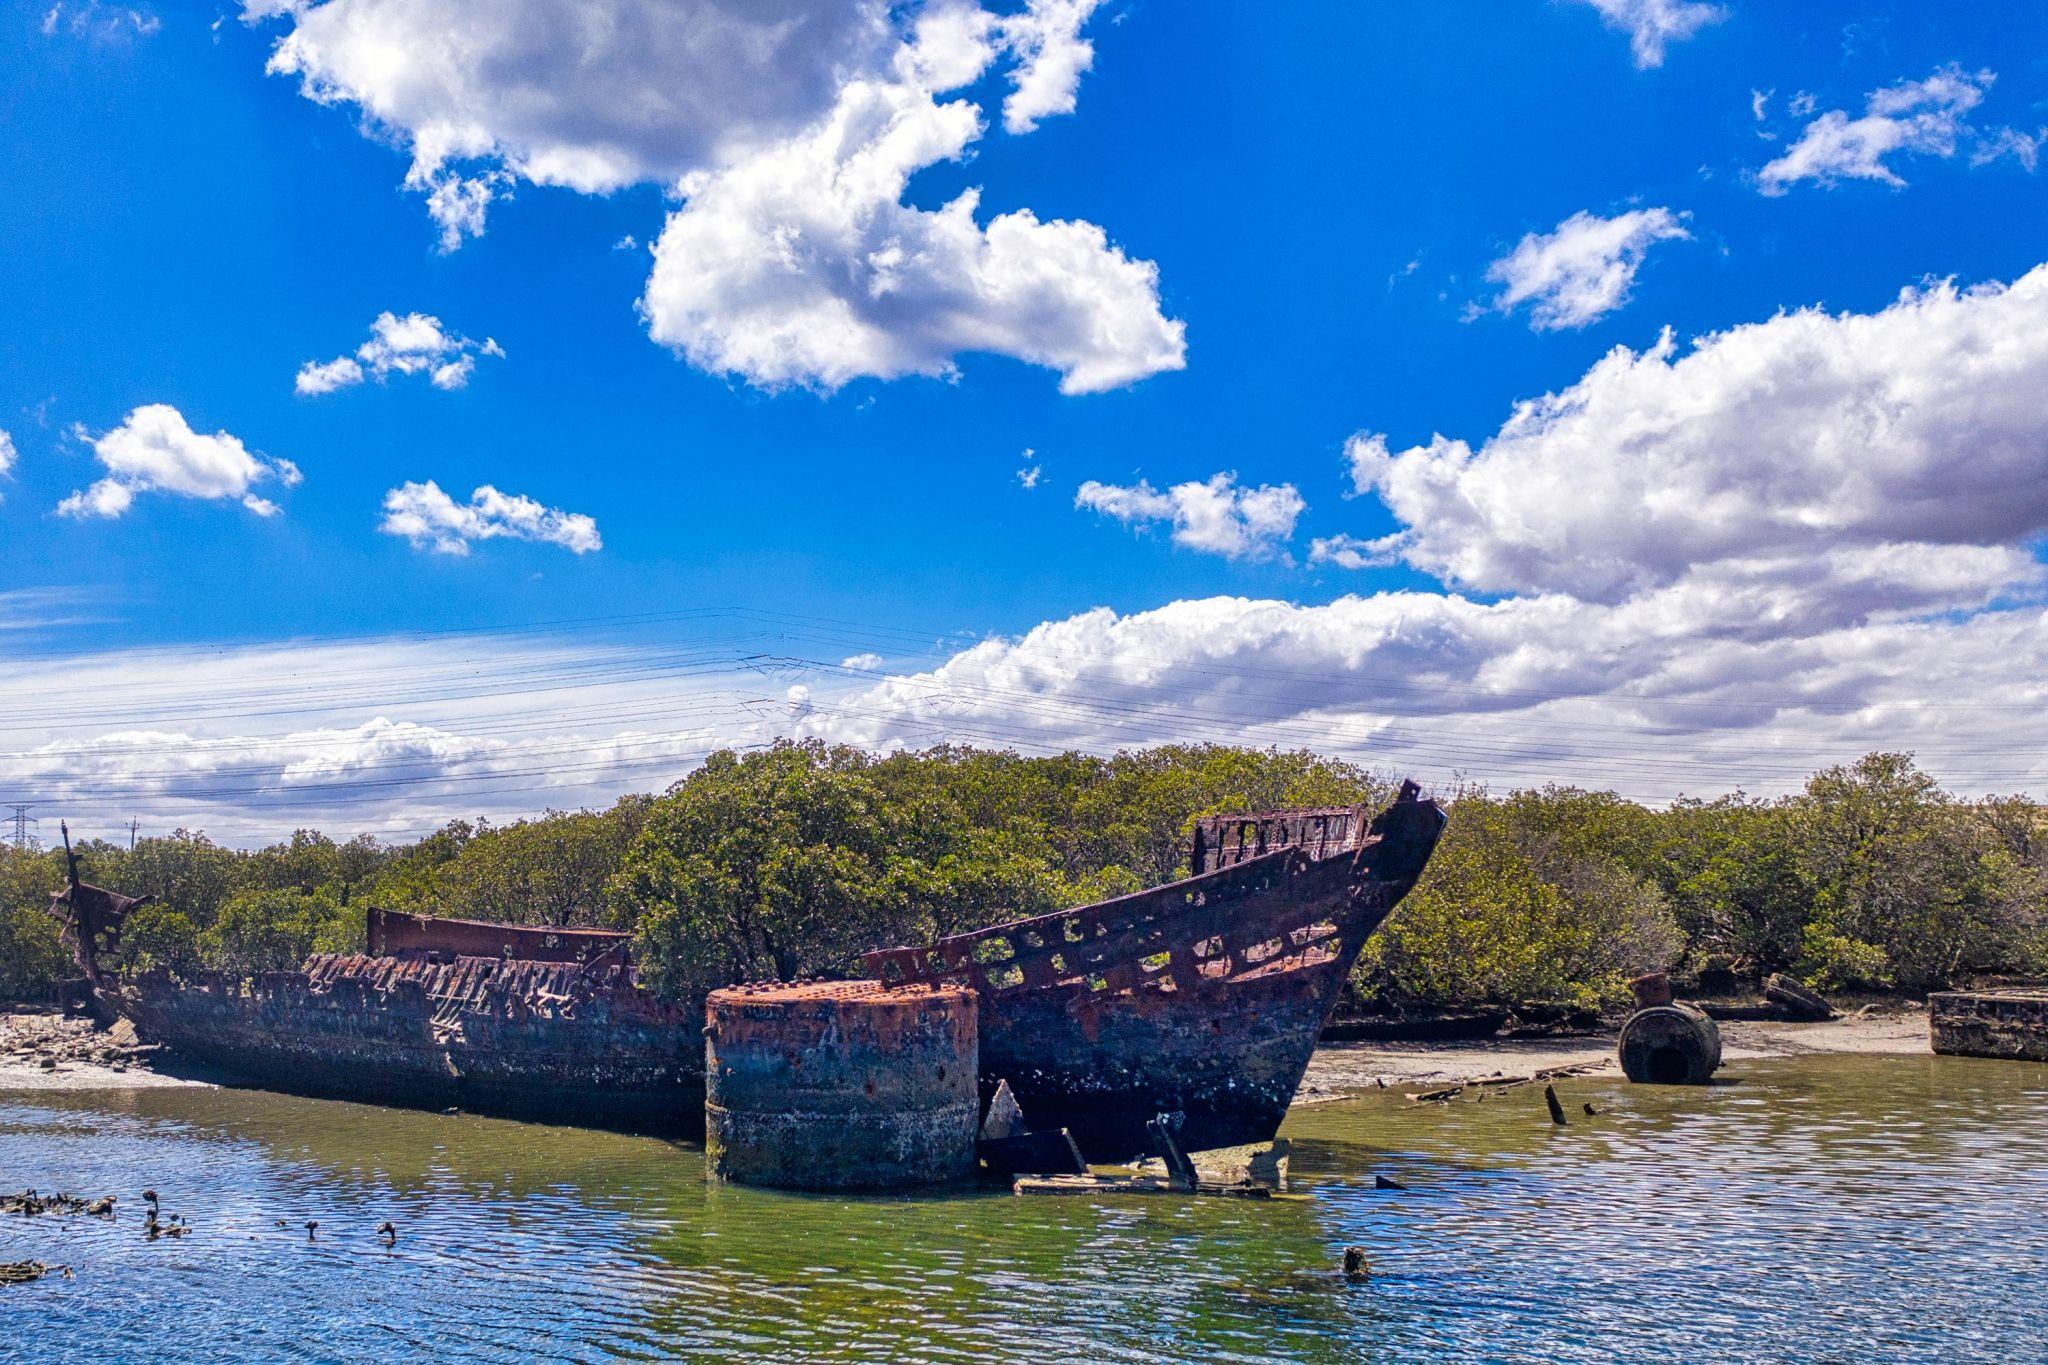 Garden Island ship graveyard, Port Adelaide, South Australia, Australia